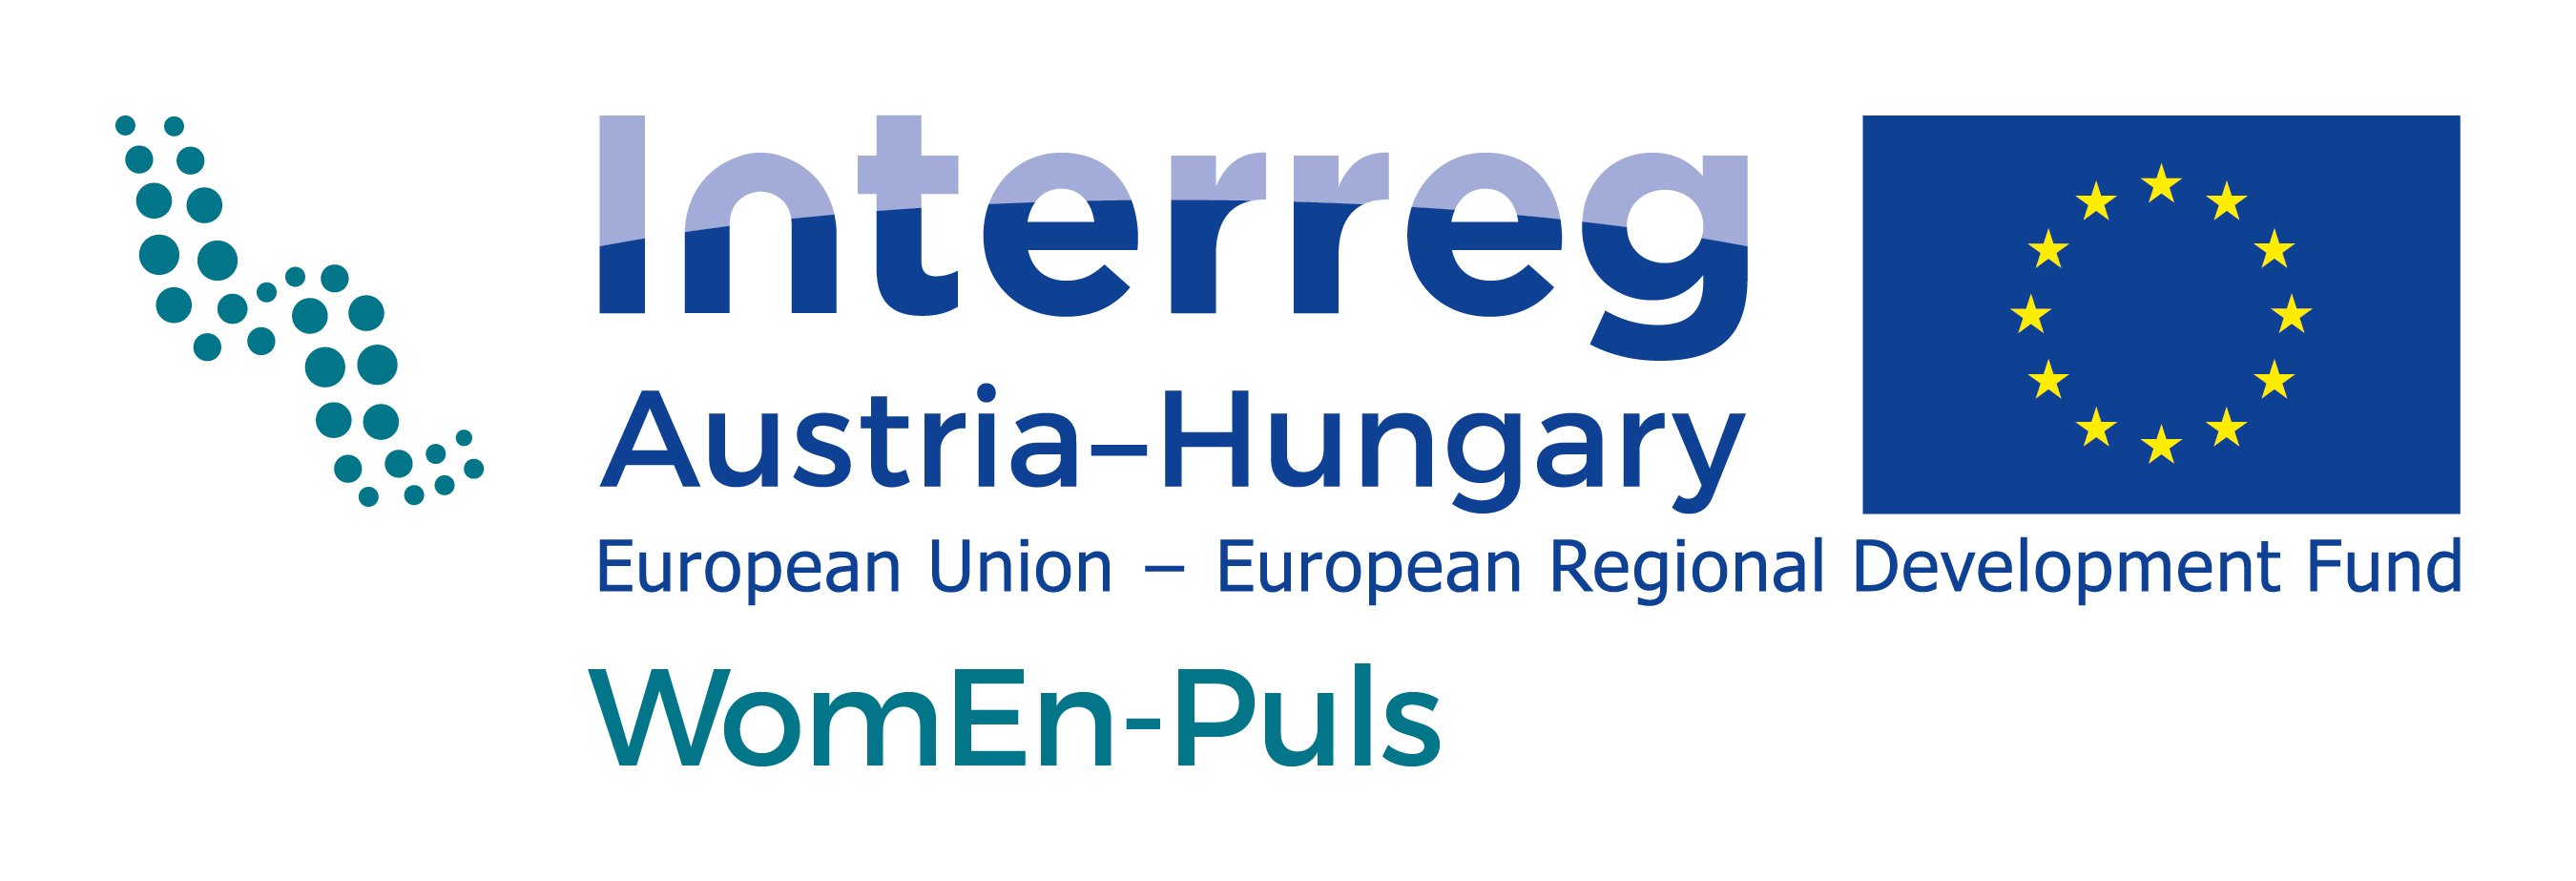 Projectlogo Interreg AT-HU_WomEn-Puls_rgb